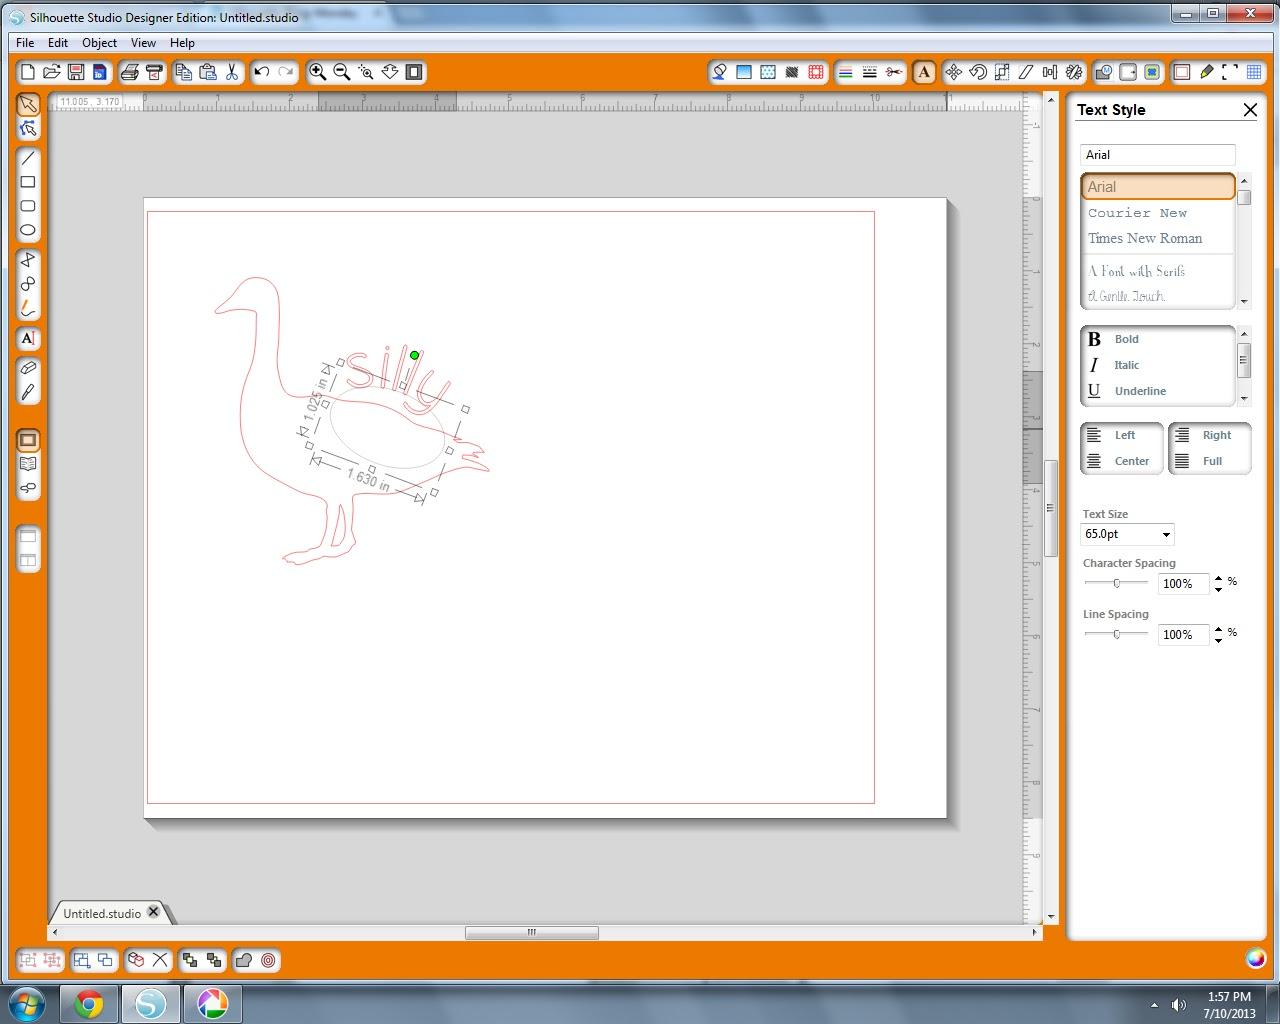 icon size ipad retina qmL